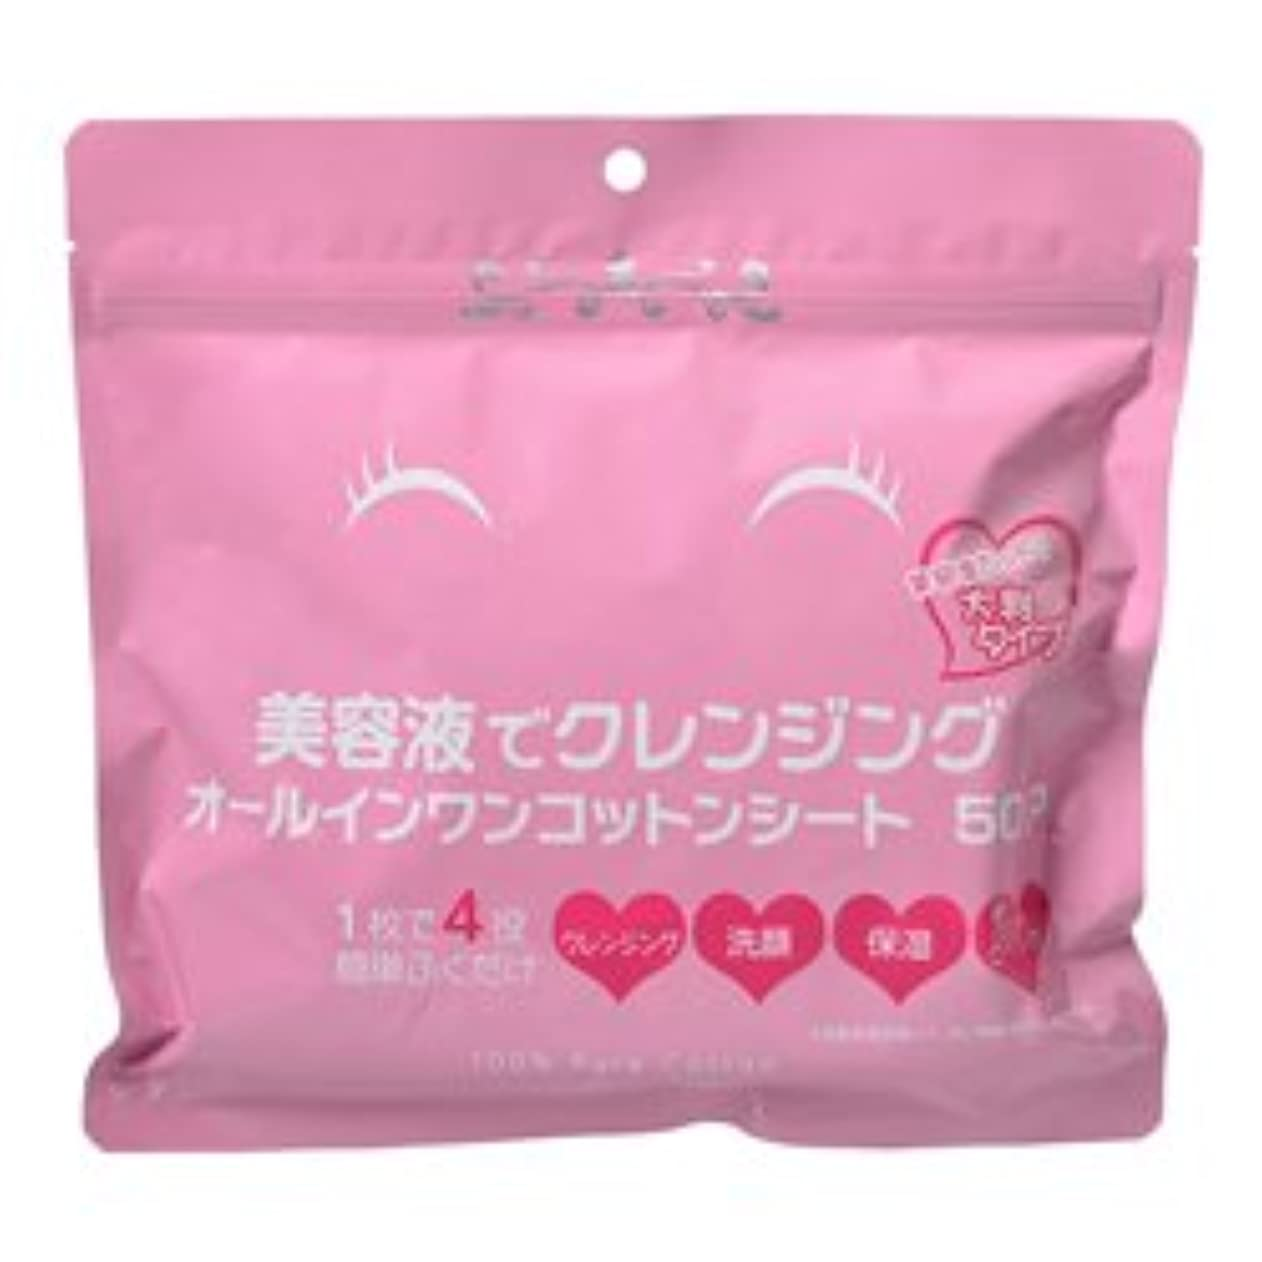 【Stay Free】美容液でクレンジング オールインシート 50枚 ×5個セット